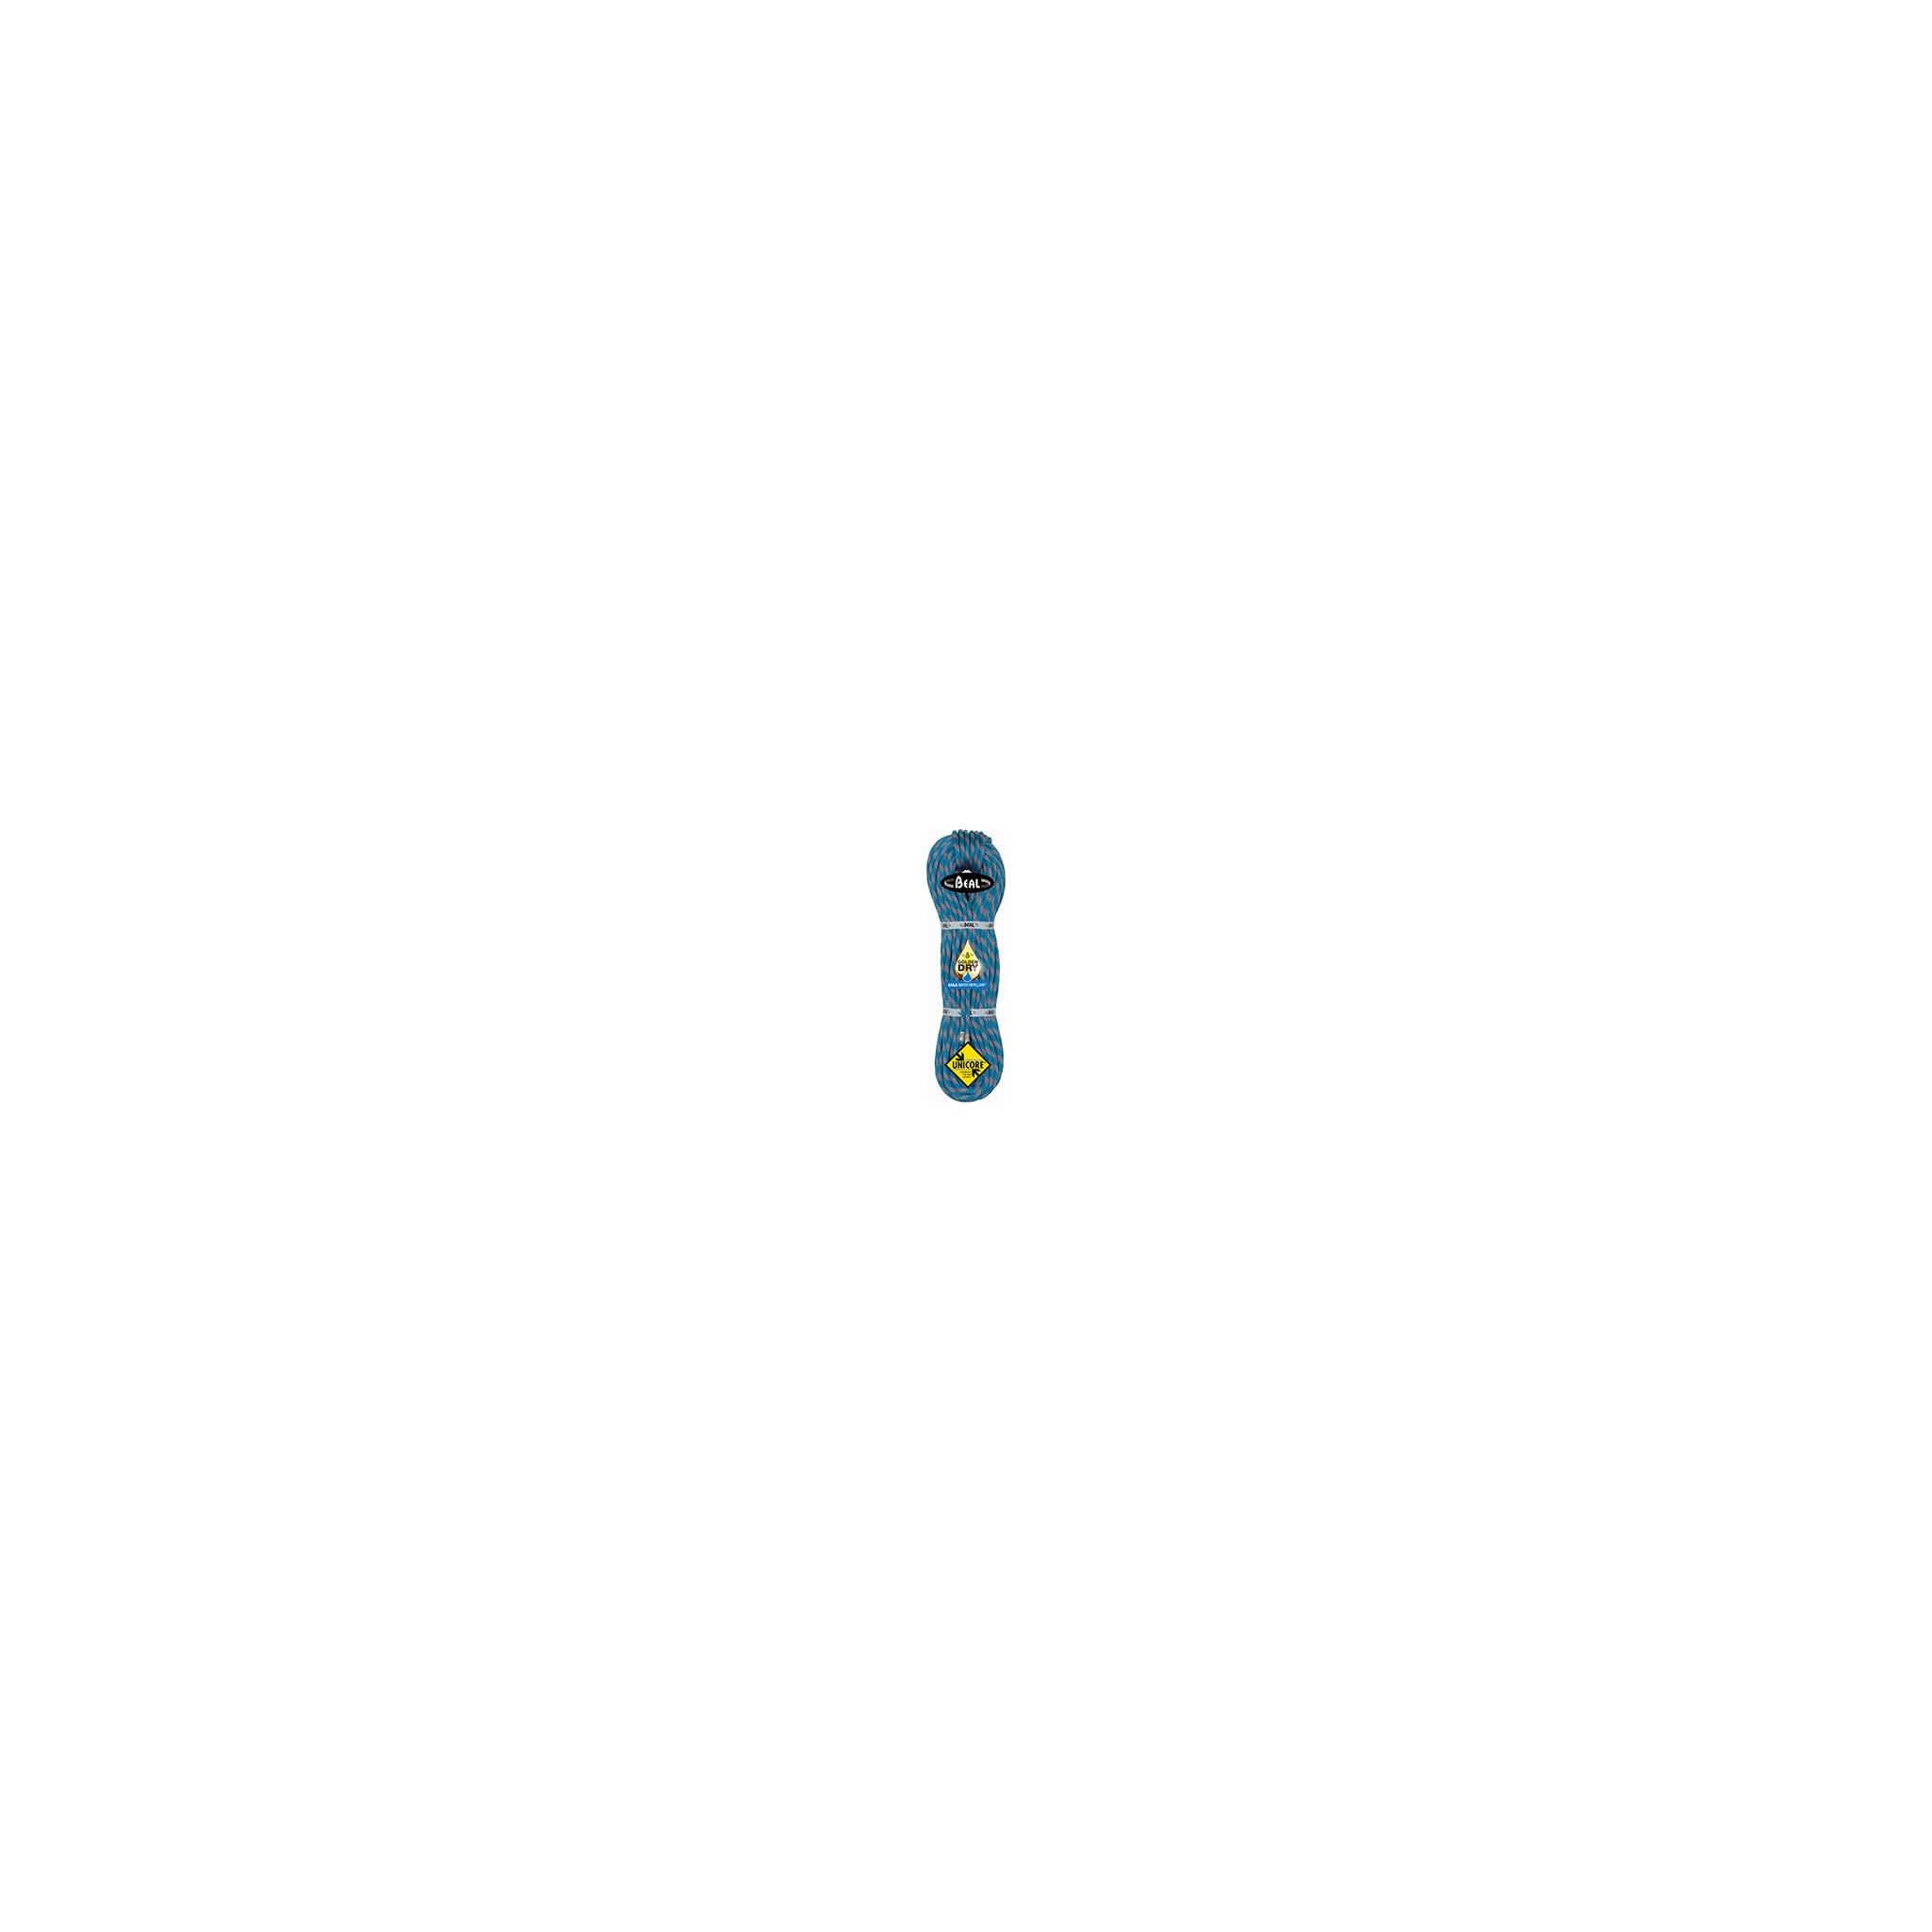 Slitesterkt halvtau med Beals fantastiske Unicoreteknologi